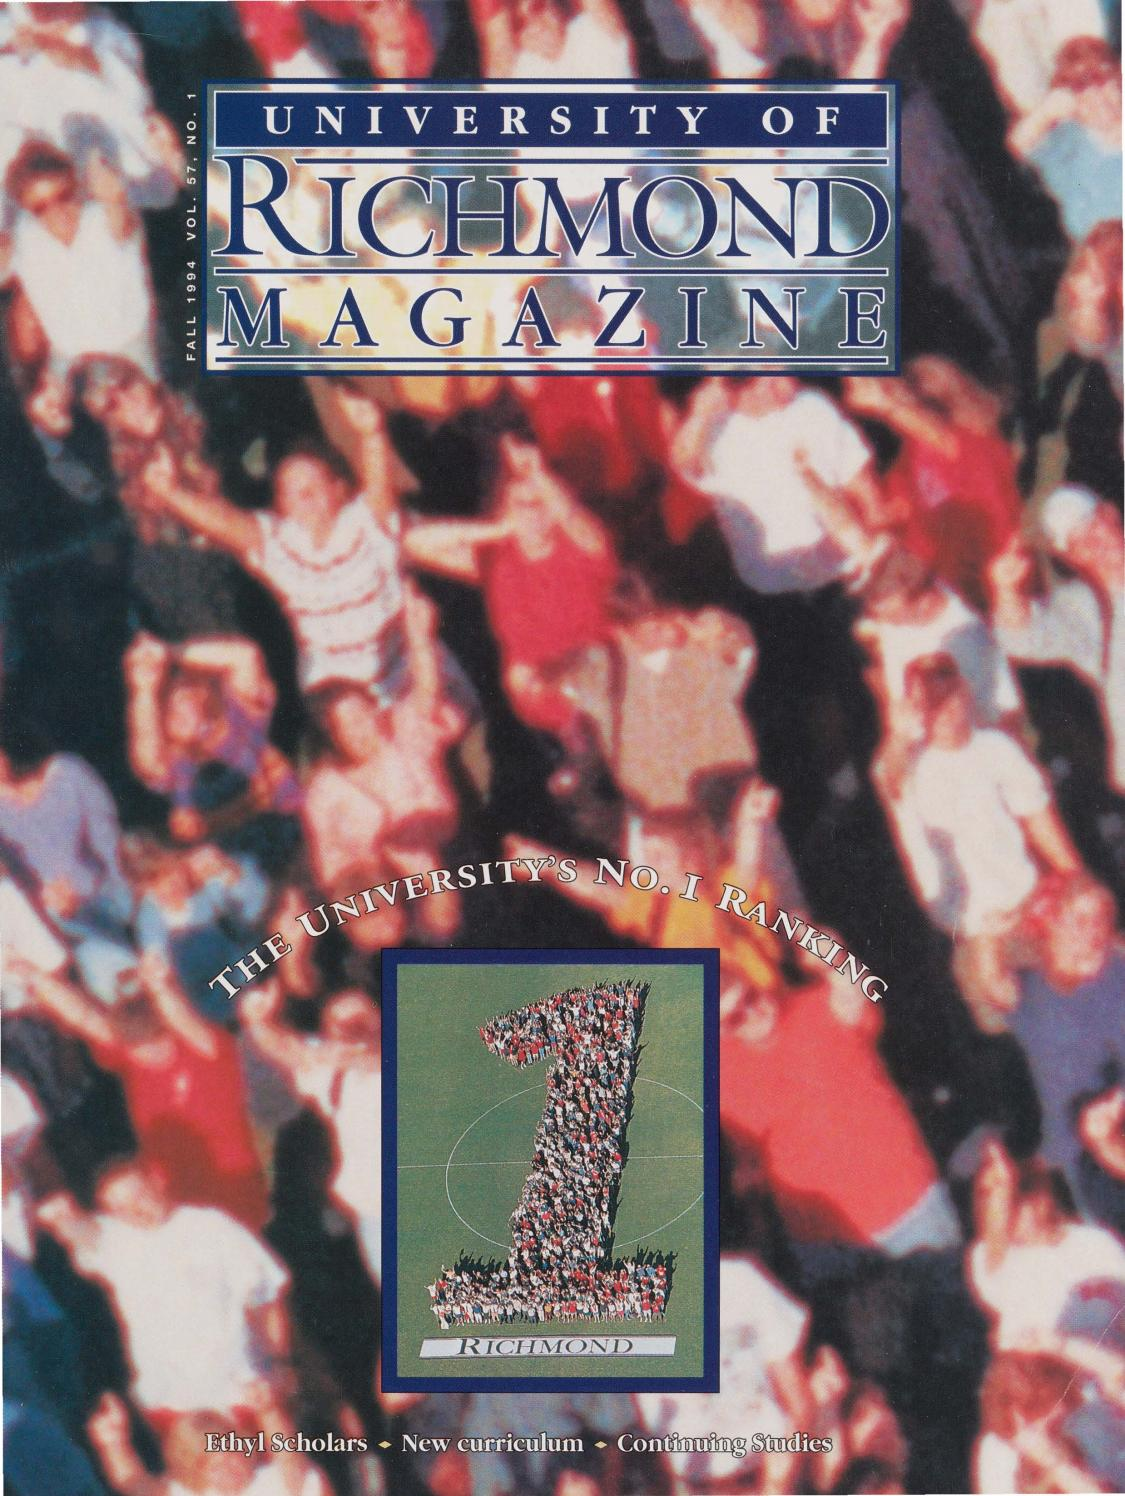 University of Richmond Magazine Fall 1994 by UR Scholarship